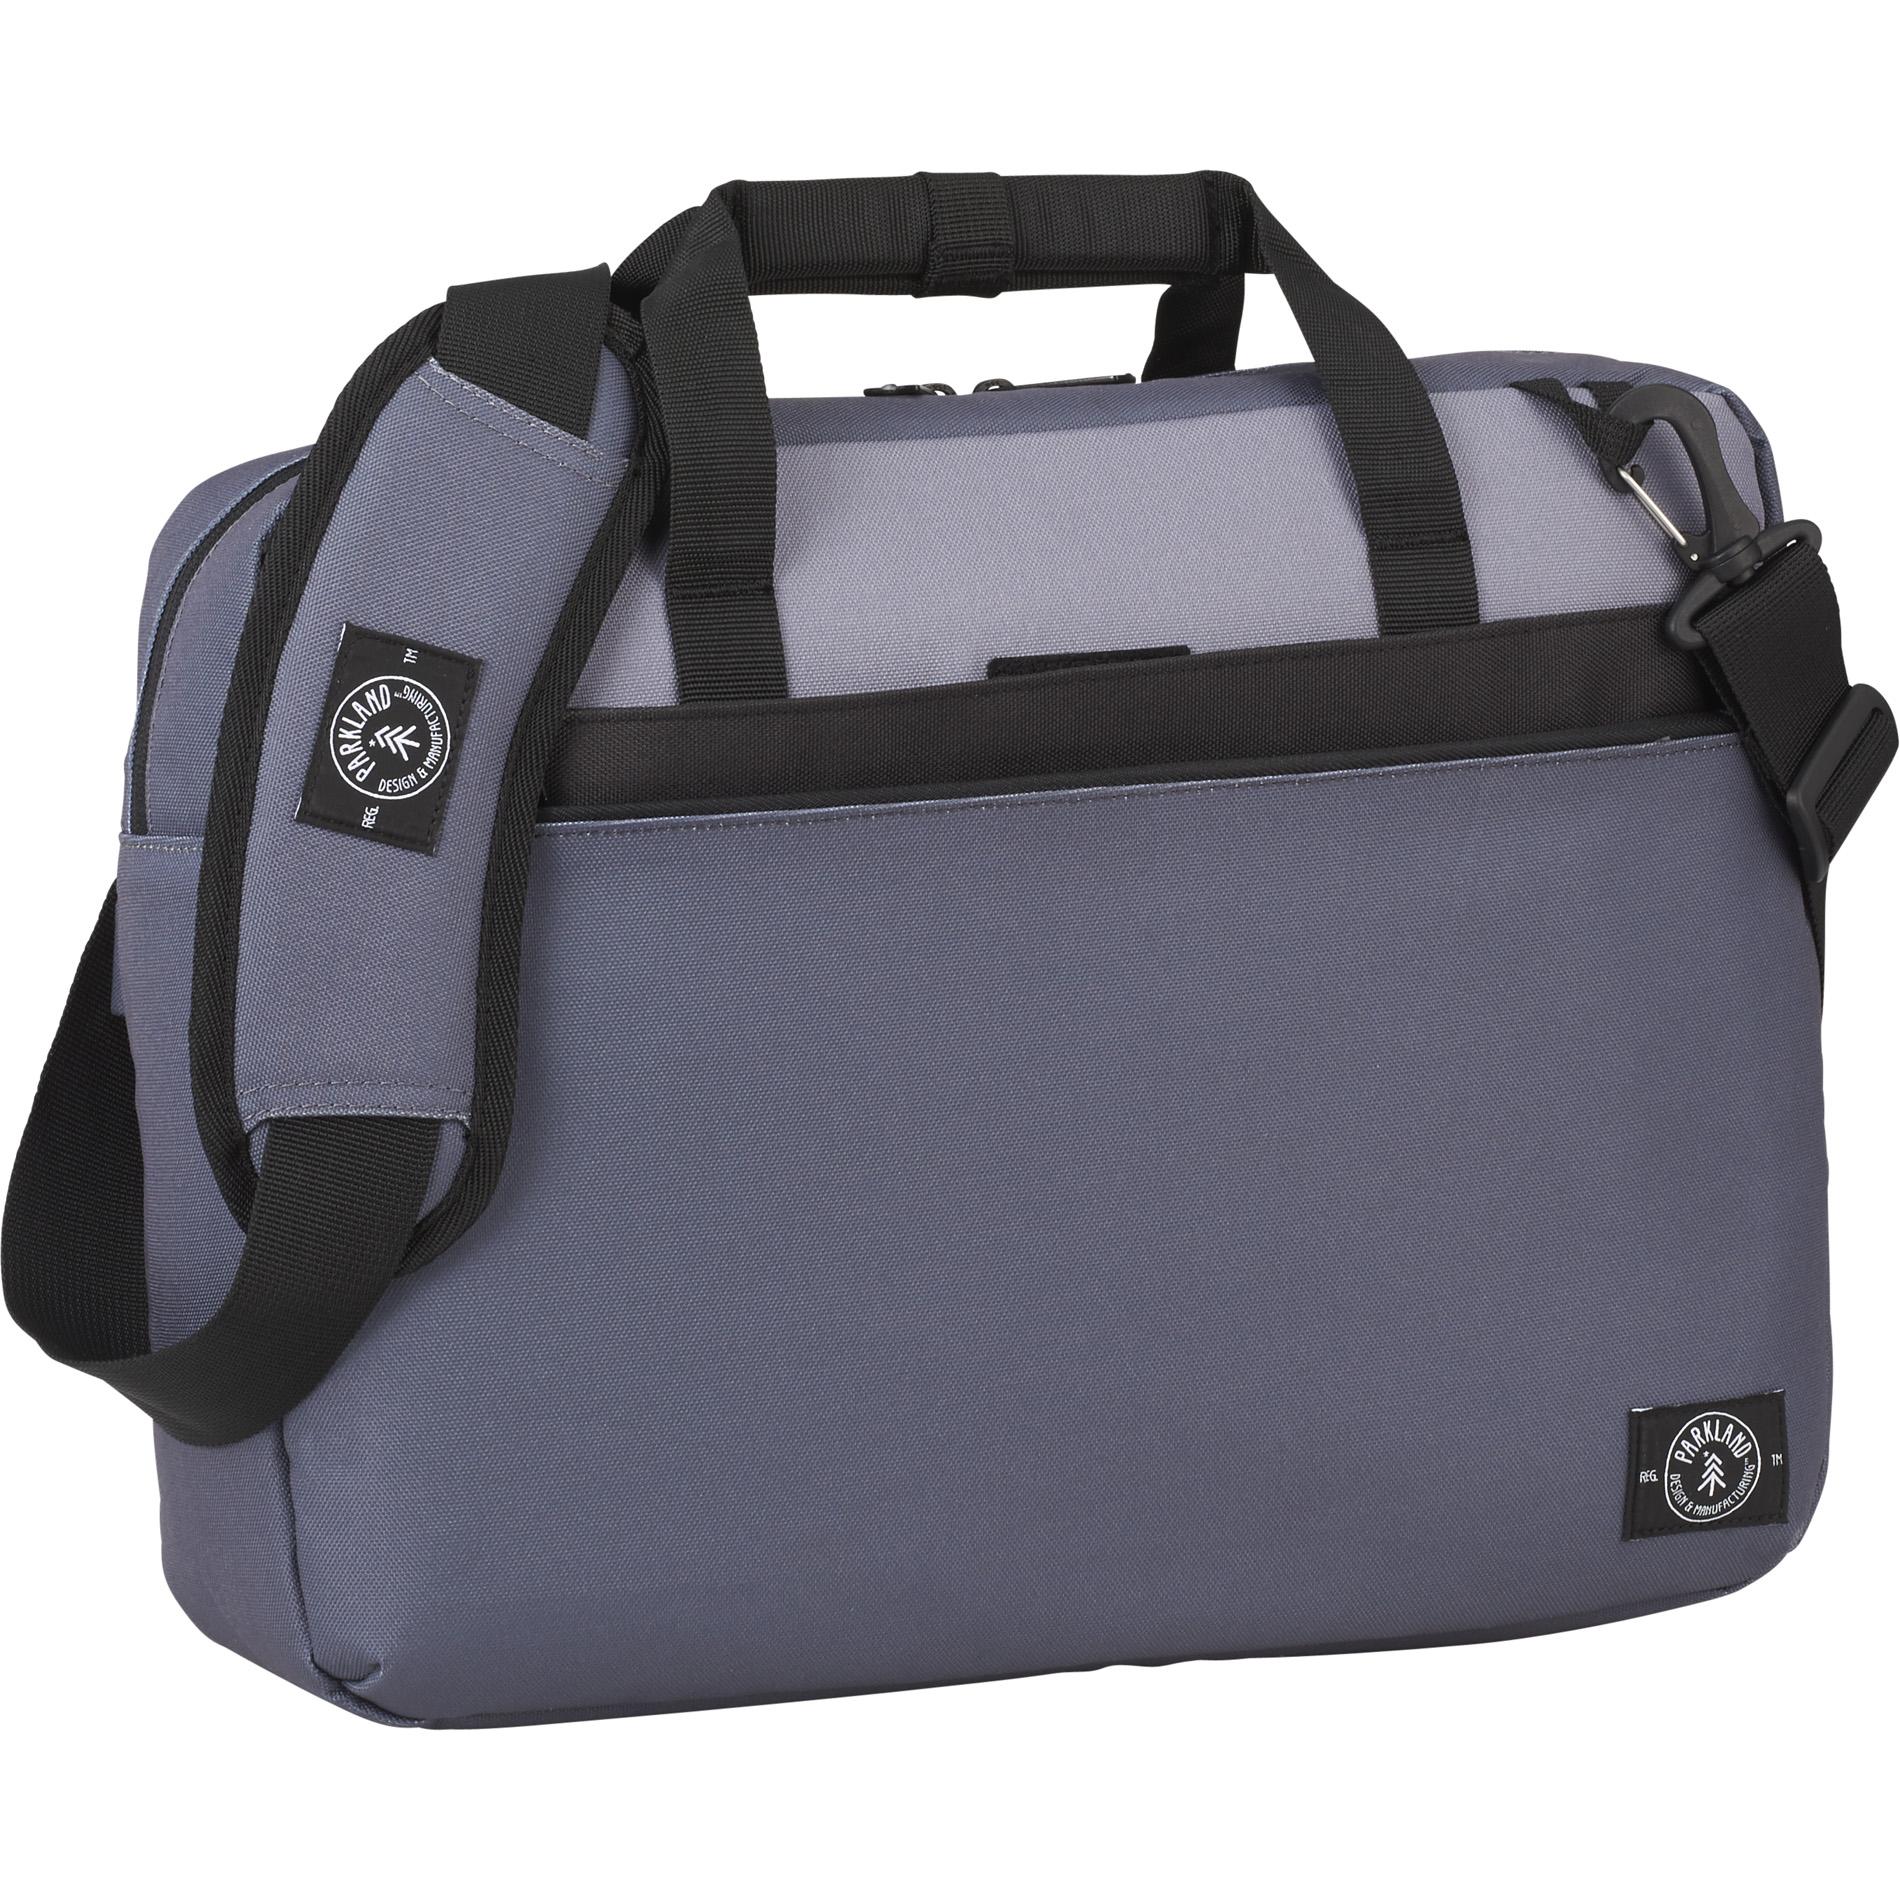 Parkland 7275-14 - Sxript Messenger Bag